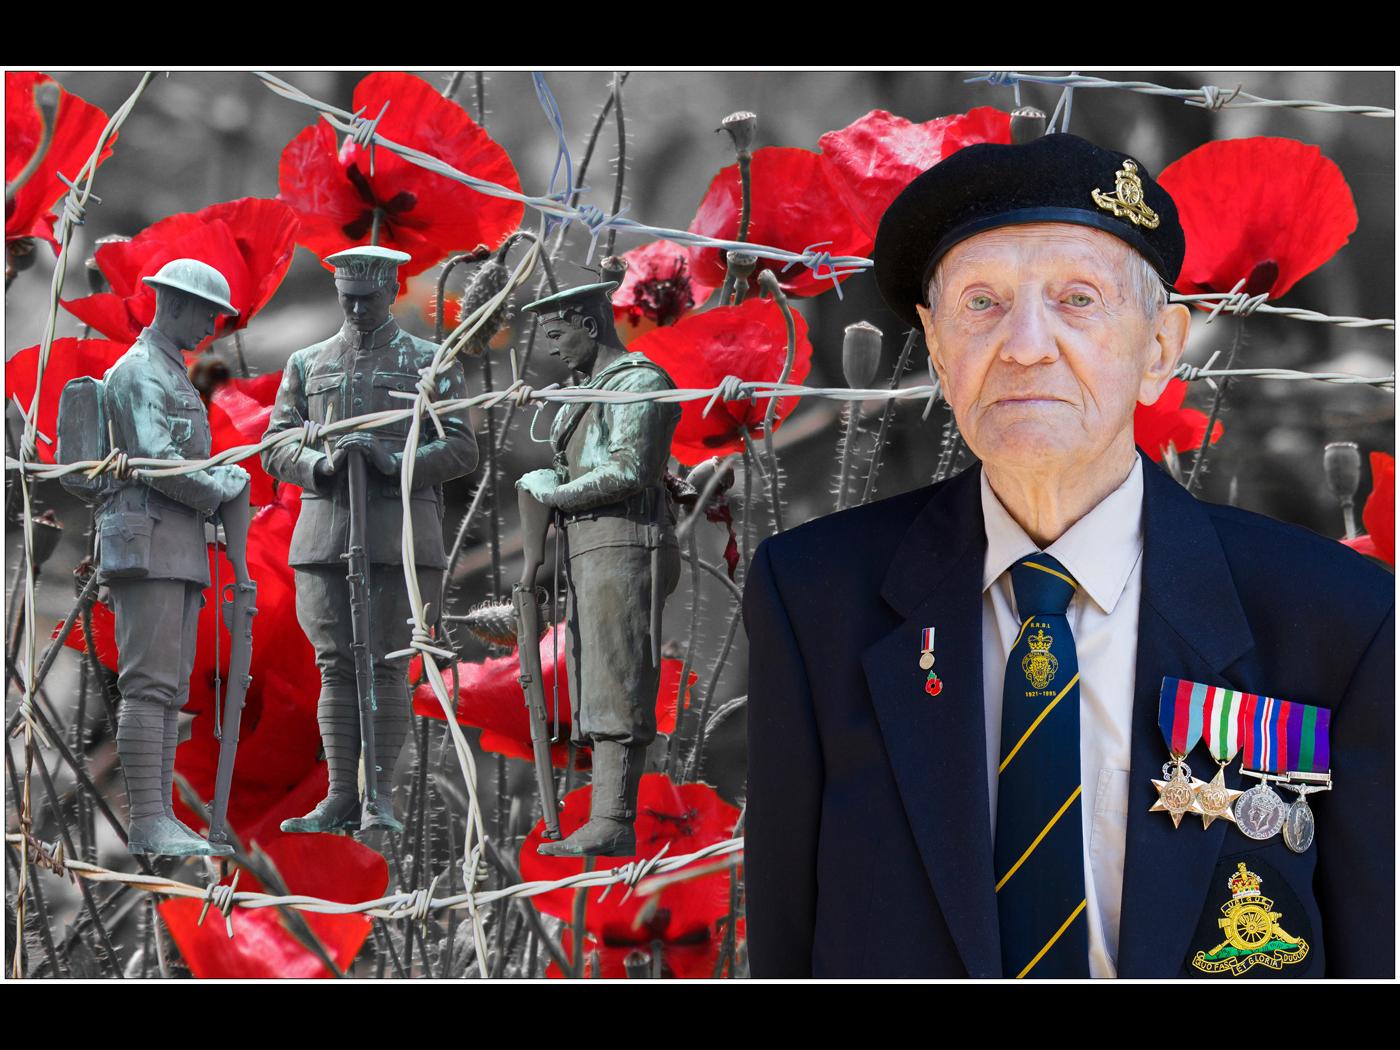 Remembering the Fallen (1914 - 2014